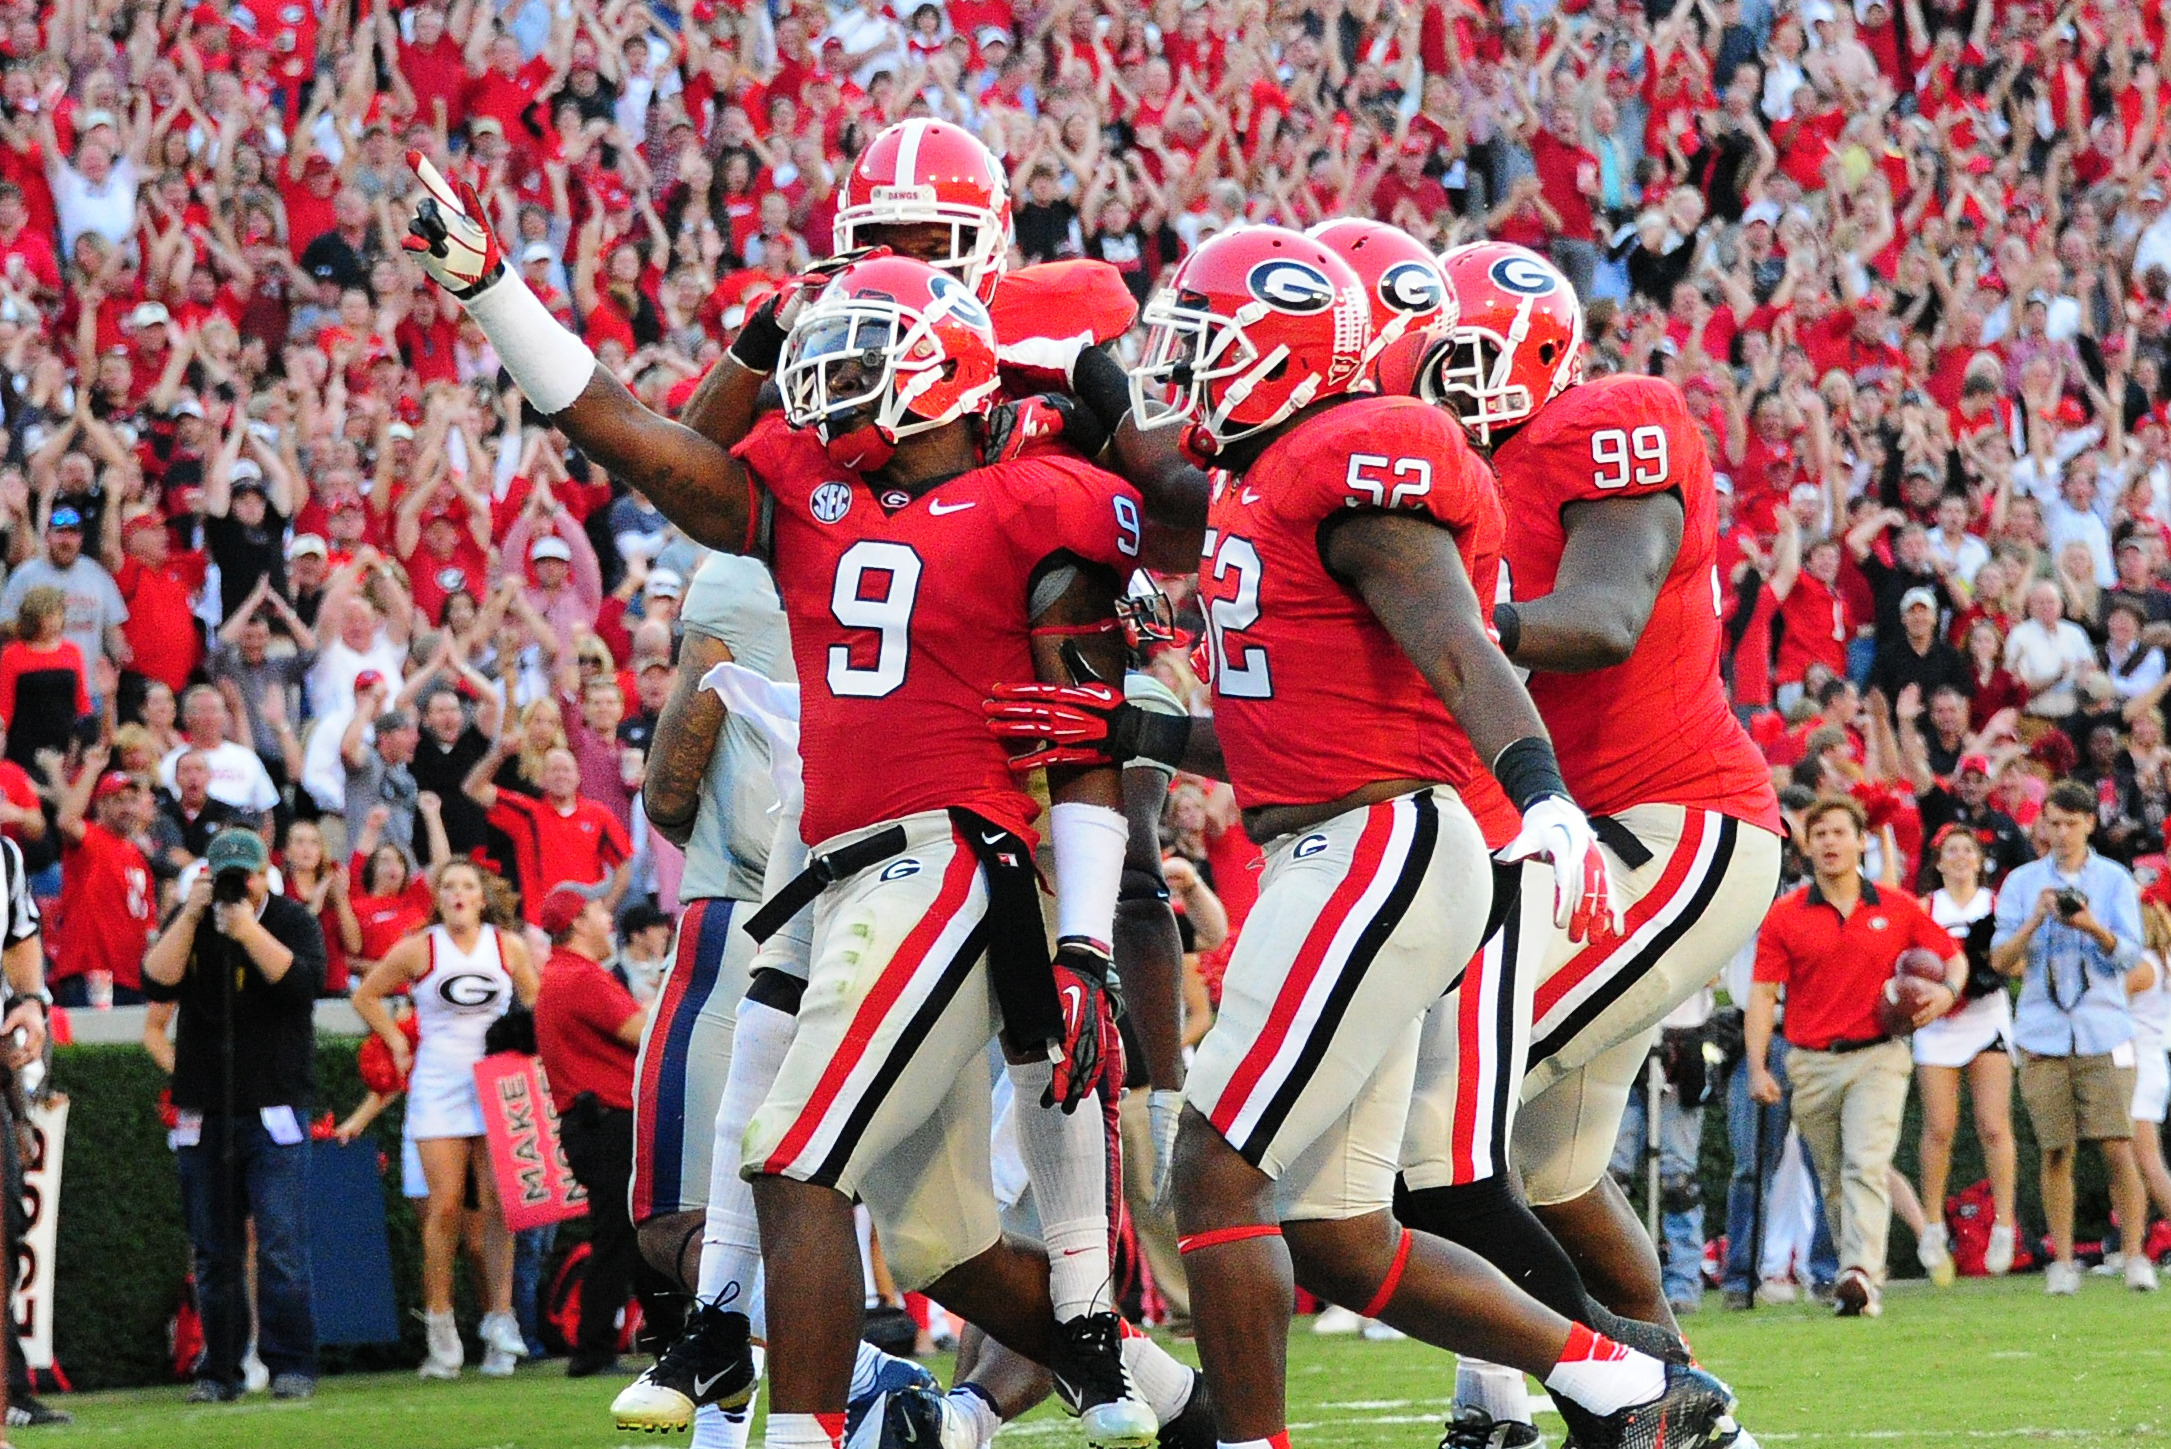 Georgia vs Auburn: TV Schedule, Live Stream, Radio, Game